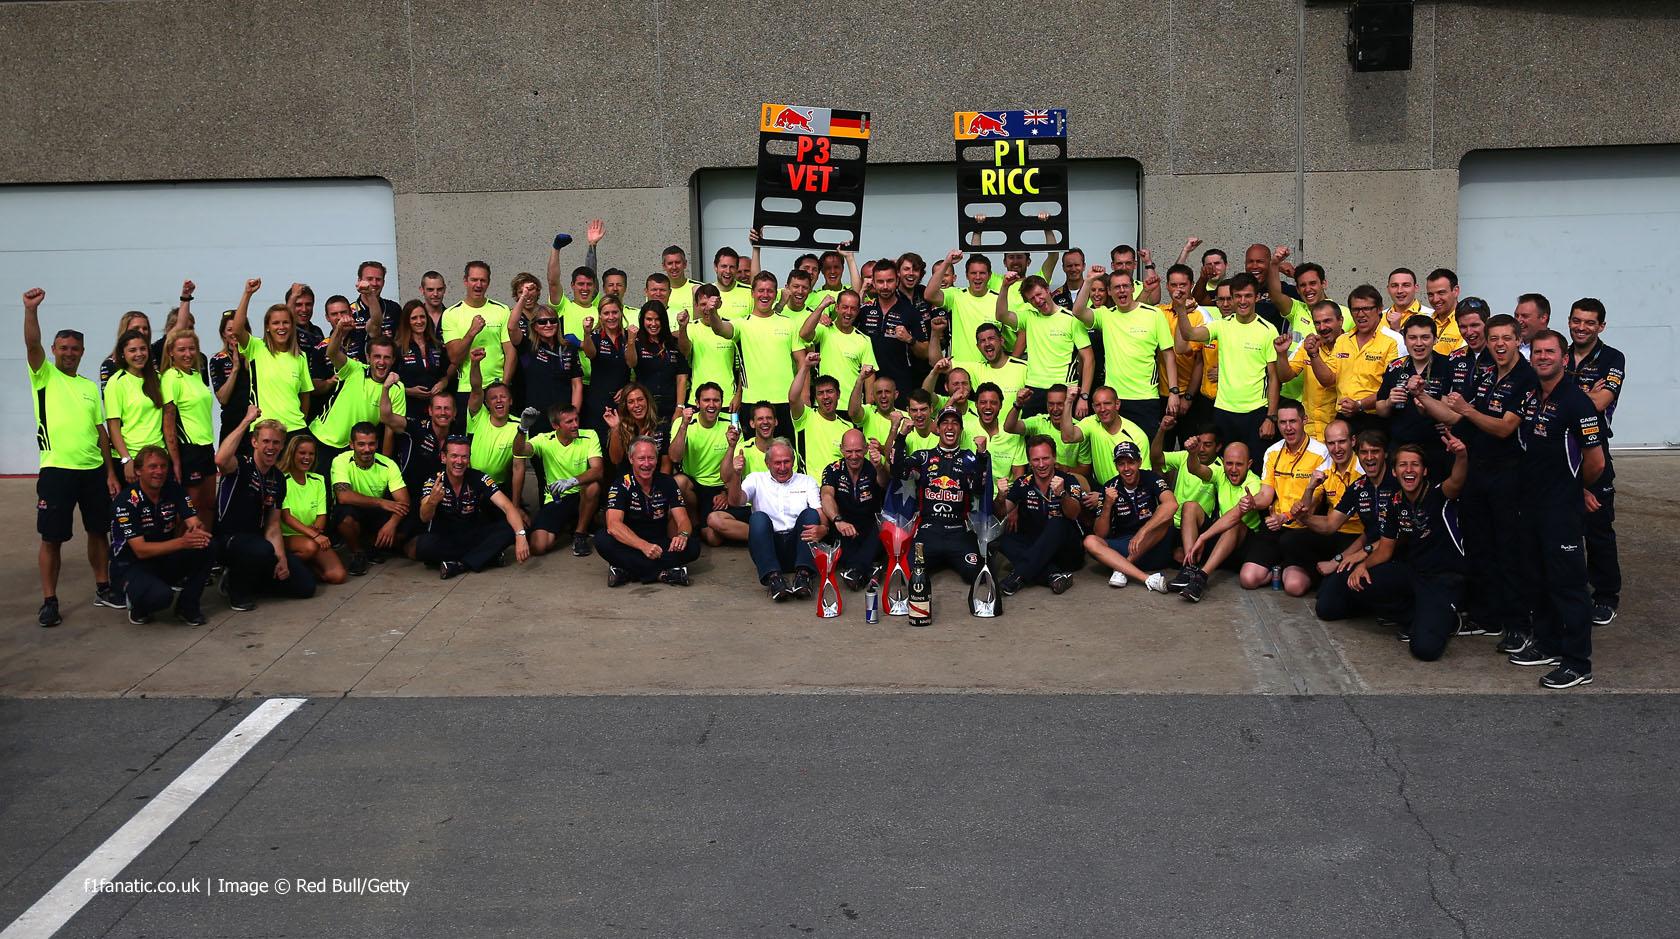 Daniel Ricciardo, Sebastian Vettel, Red Bull team, Circuit Gilles Villeneuve, 2014